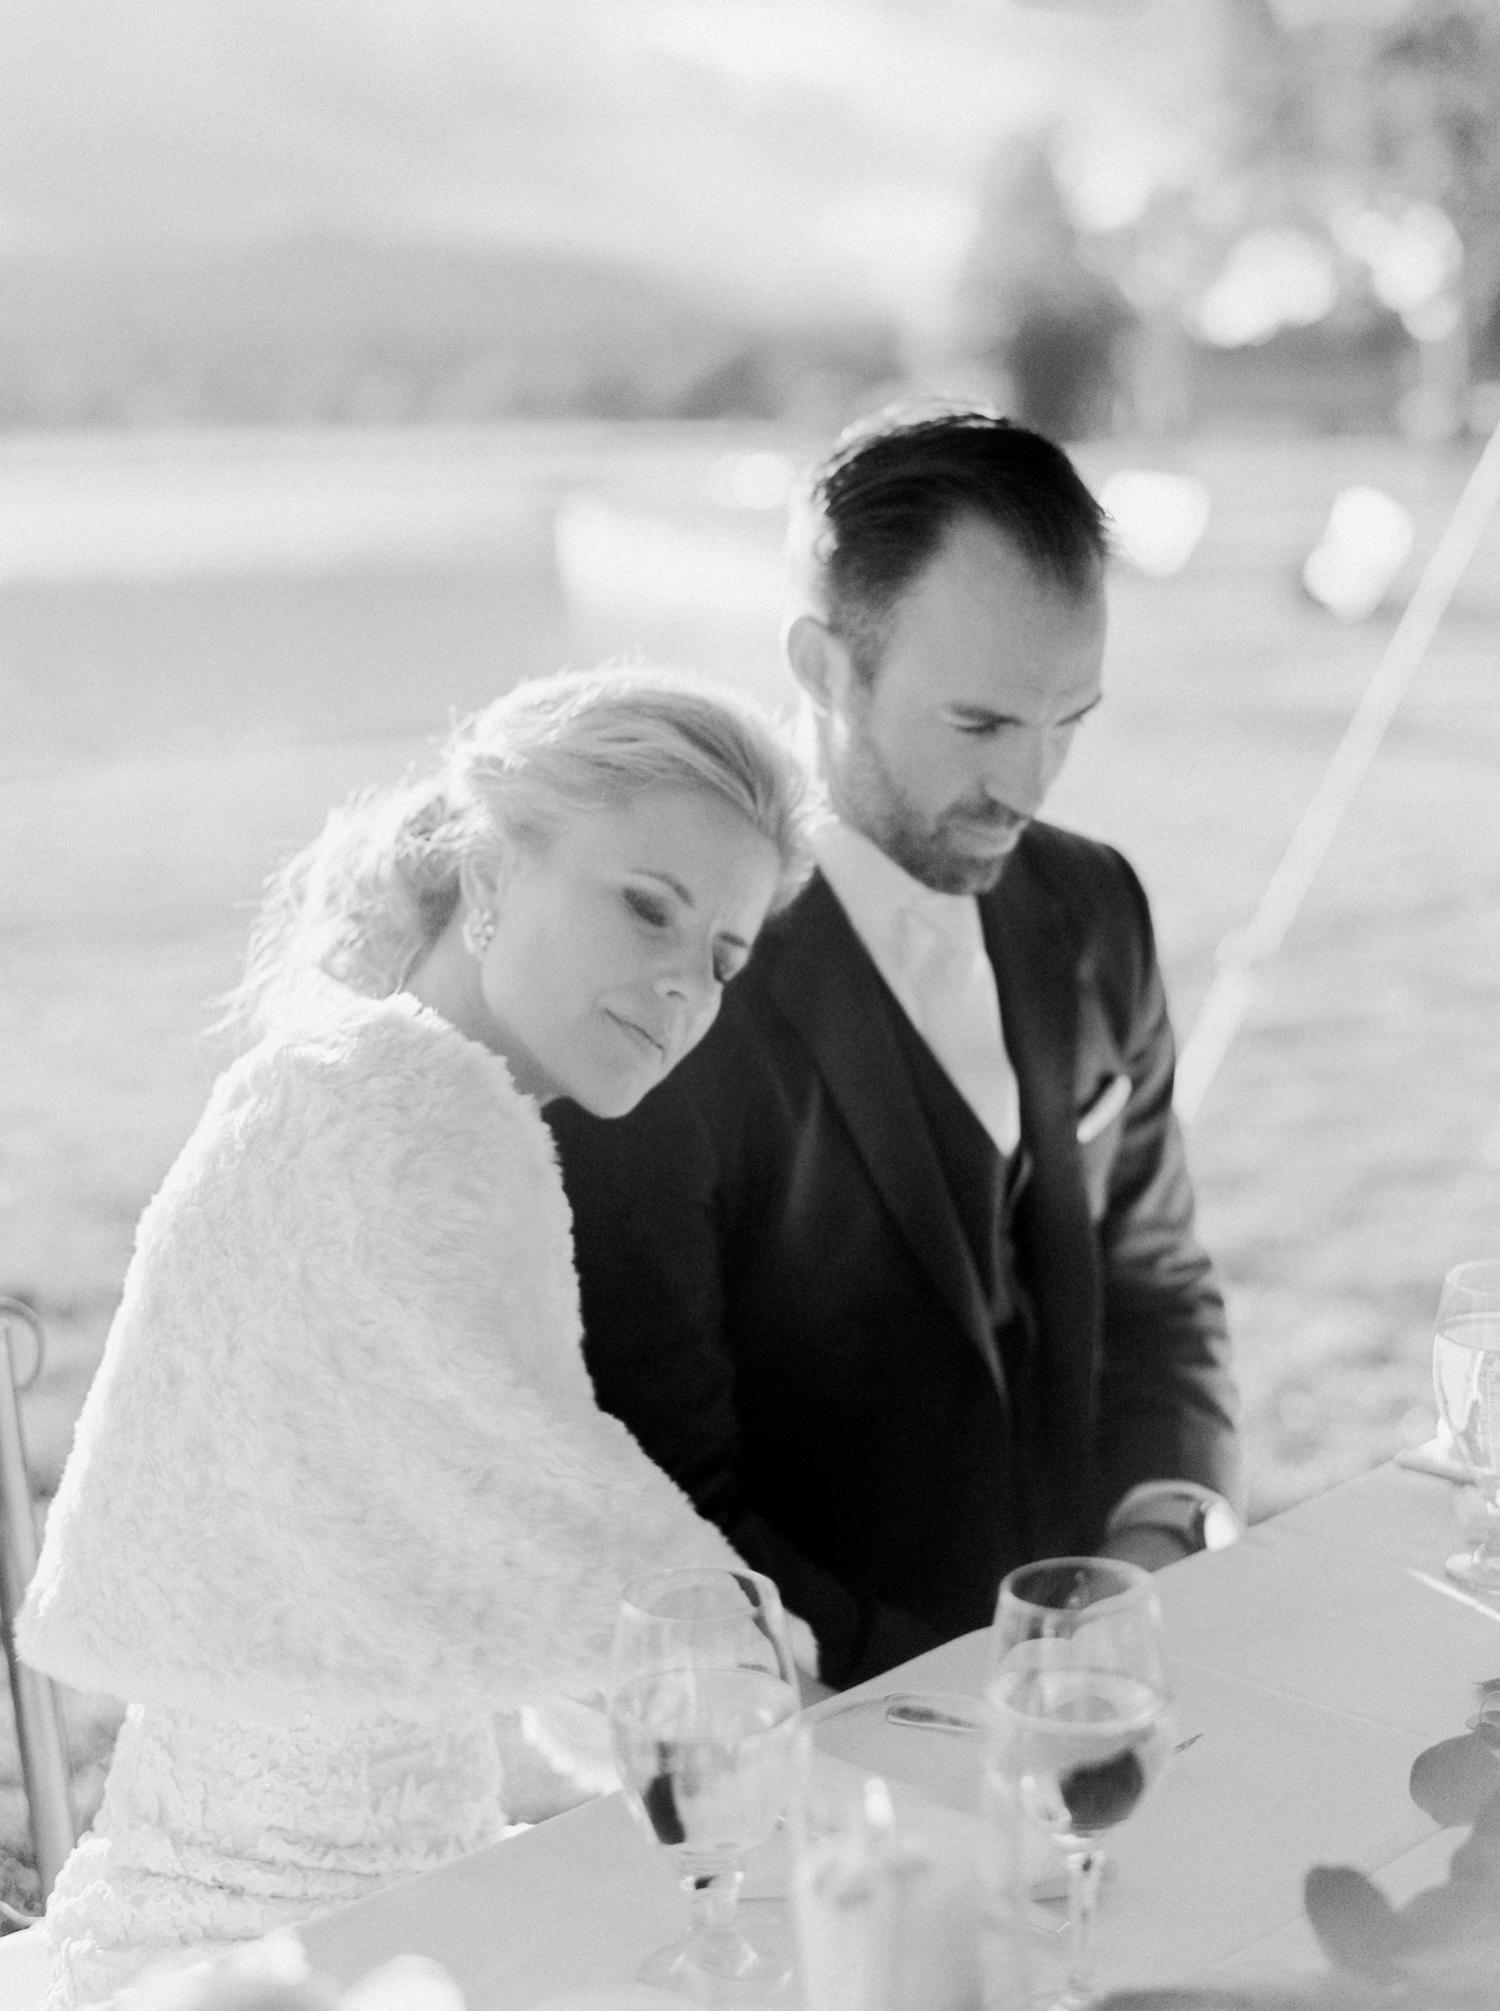 Calgary wedding photographers | oregon wedding photographers | fine art film | Justine Milton Photography | oregon wedding | wedding reception | wedding details | bride and groom